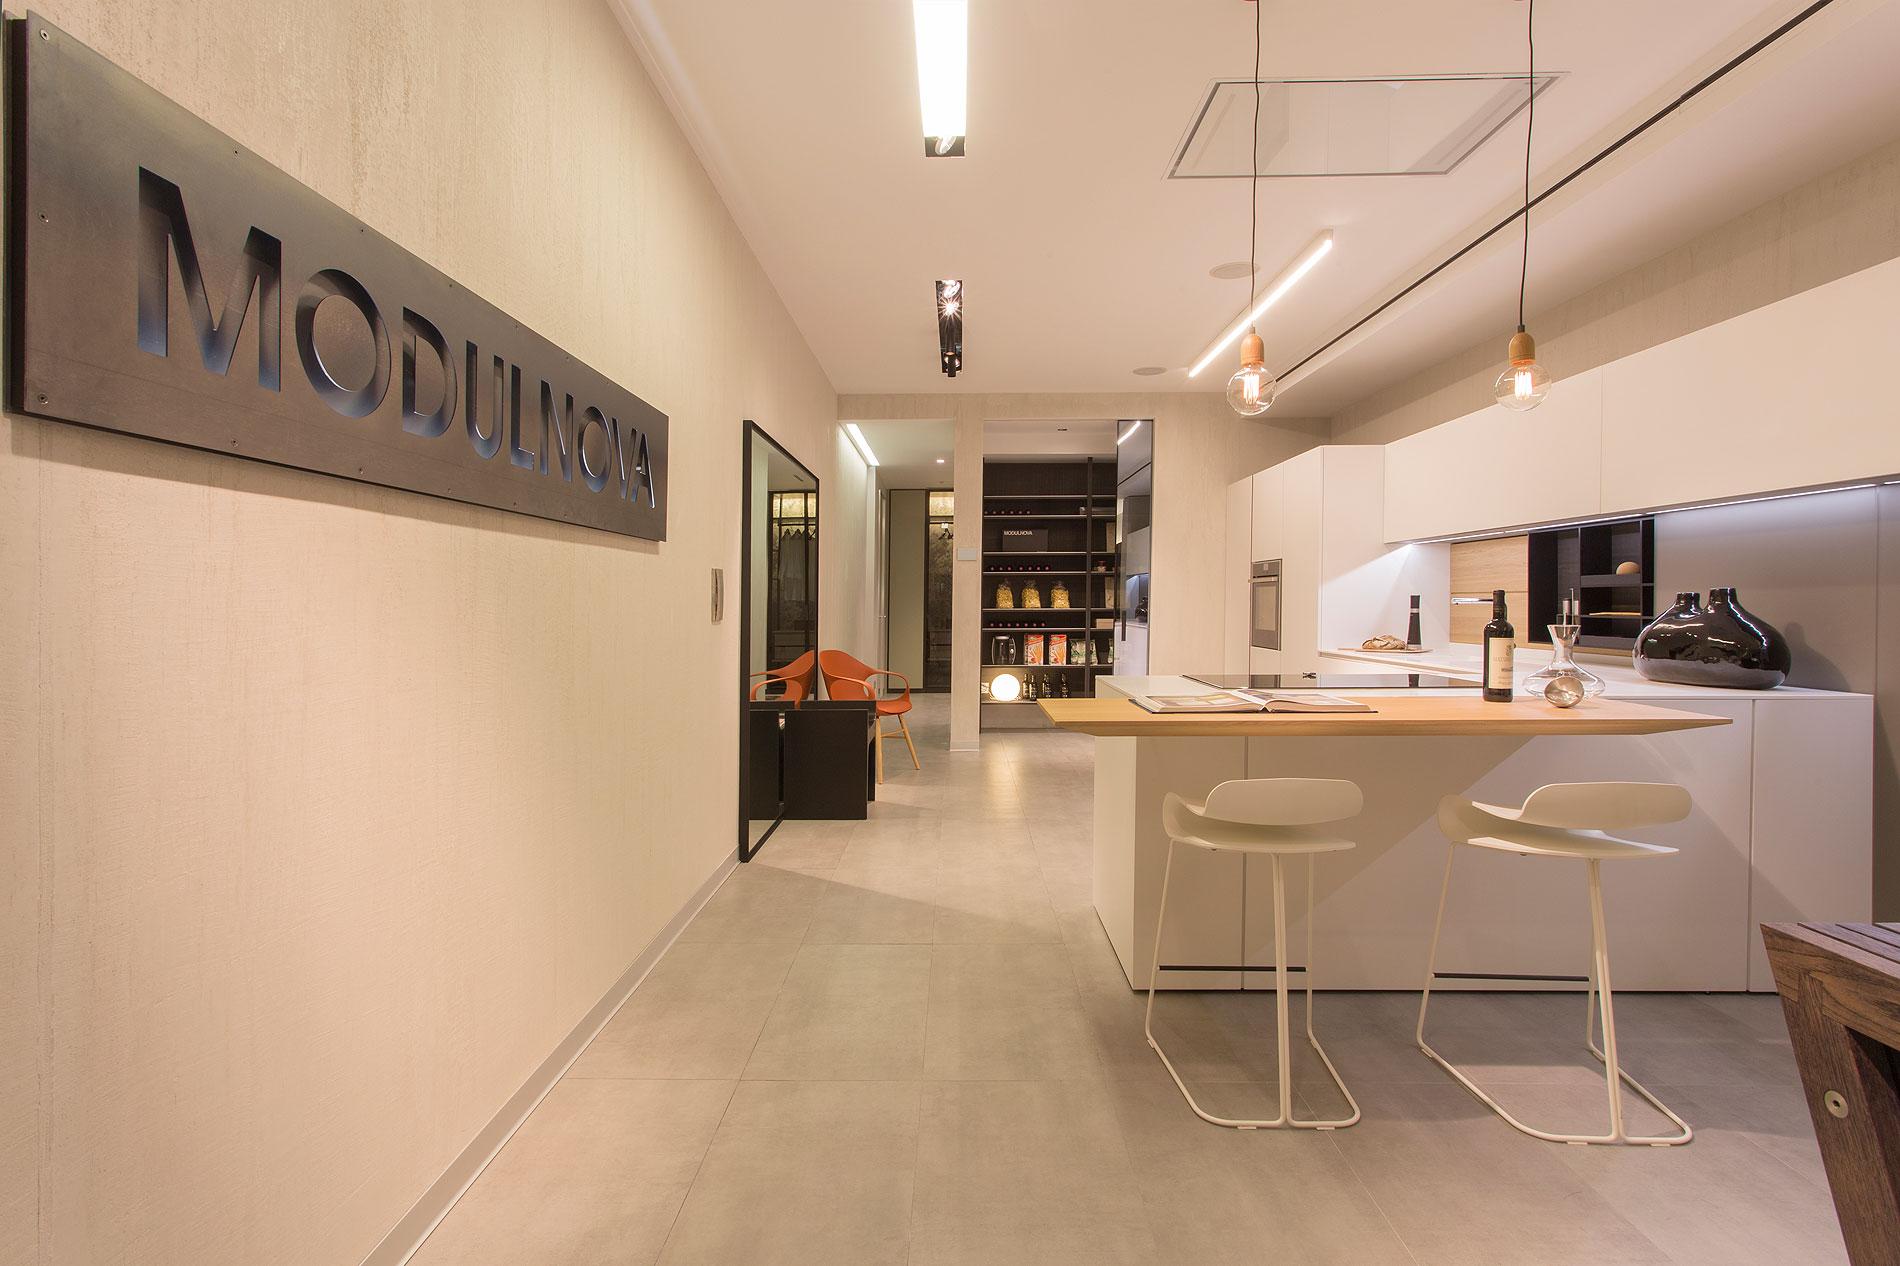 Materia nuevo showroom con primeras firmas del h bitat for Estudio interiorismo madrid